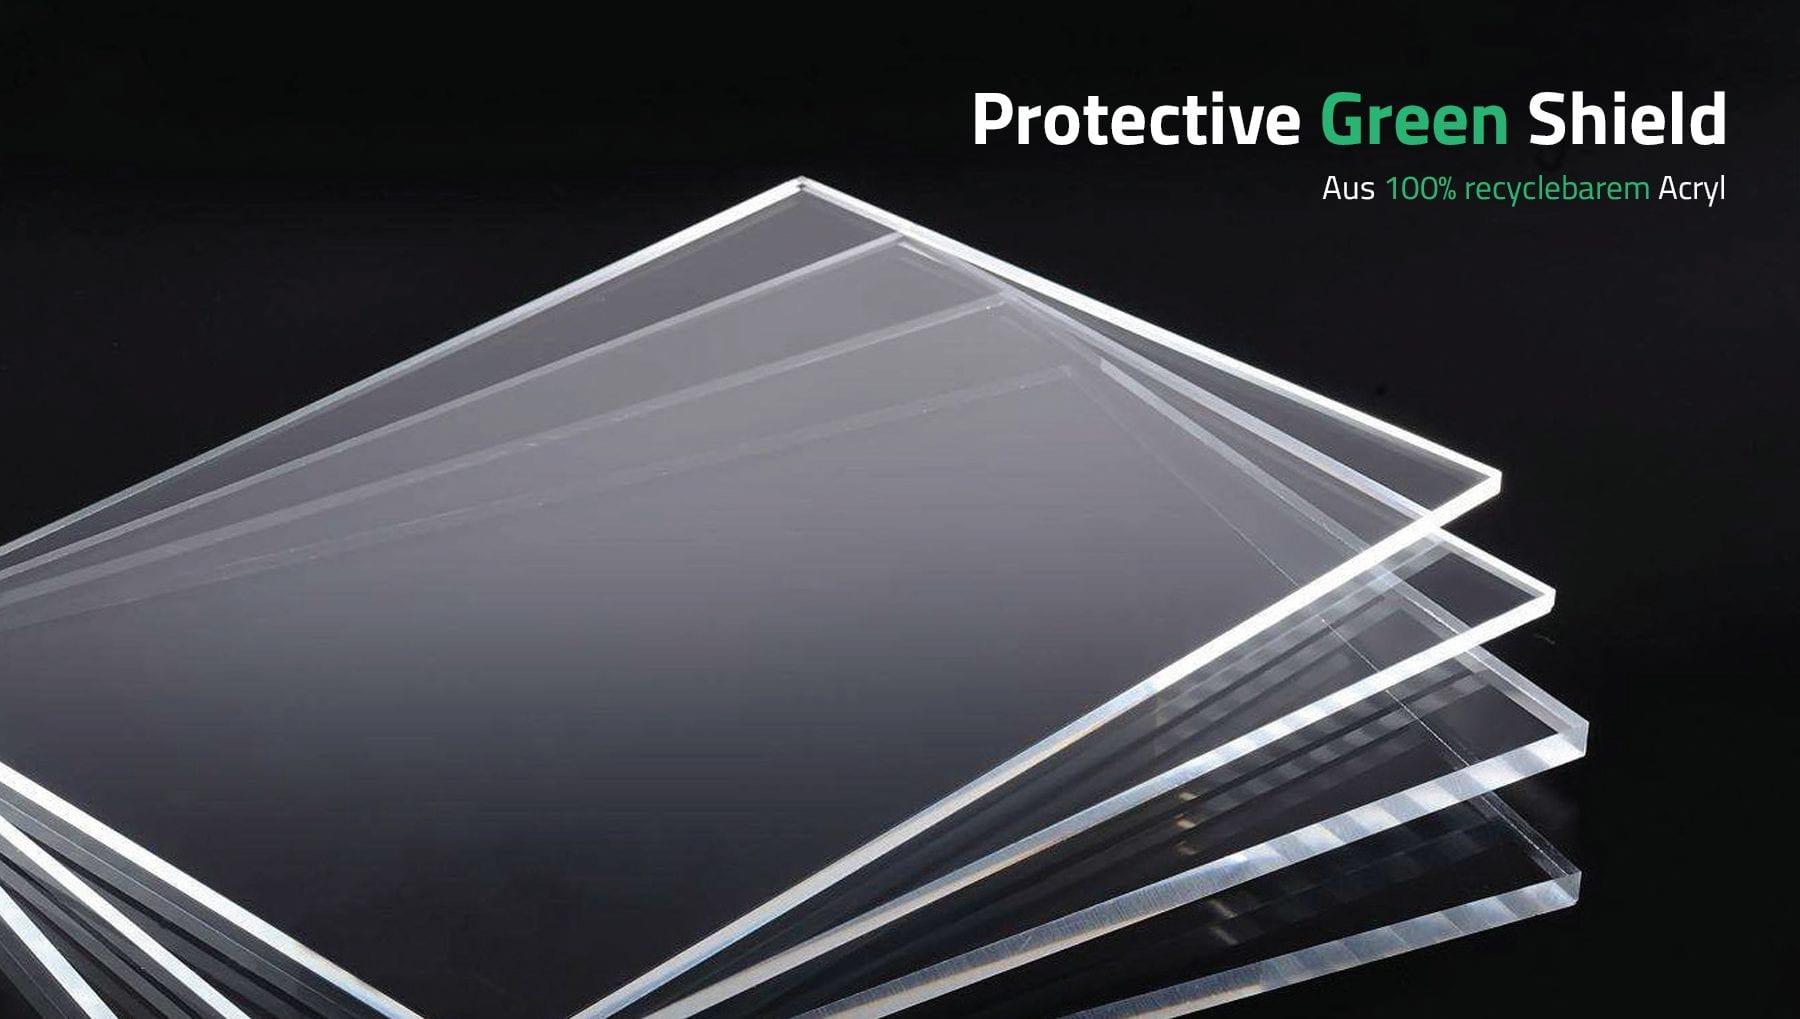 Modulex Protective Green Shield – Trennwand aus 100% recycelbarem Acryl